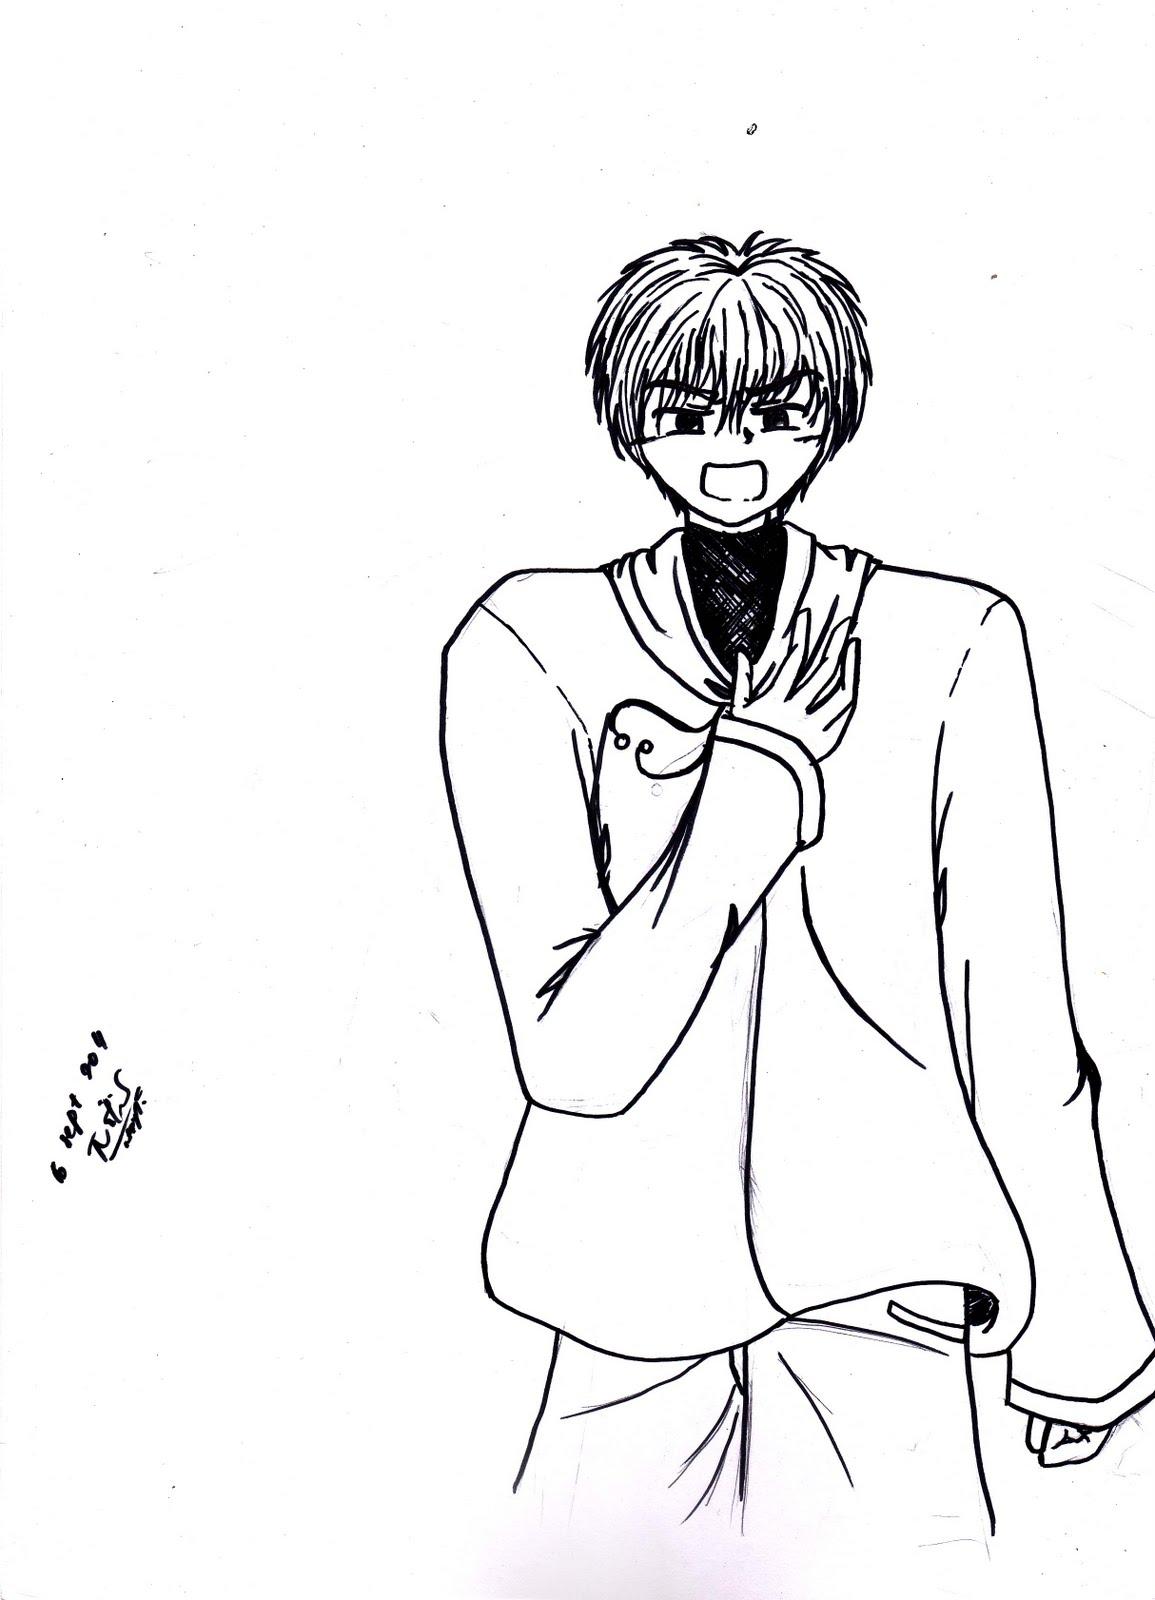 Cute Girl Sketch Wallpaper Pz C Anime Girl Sketch